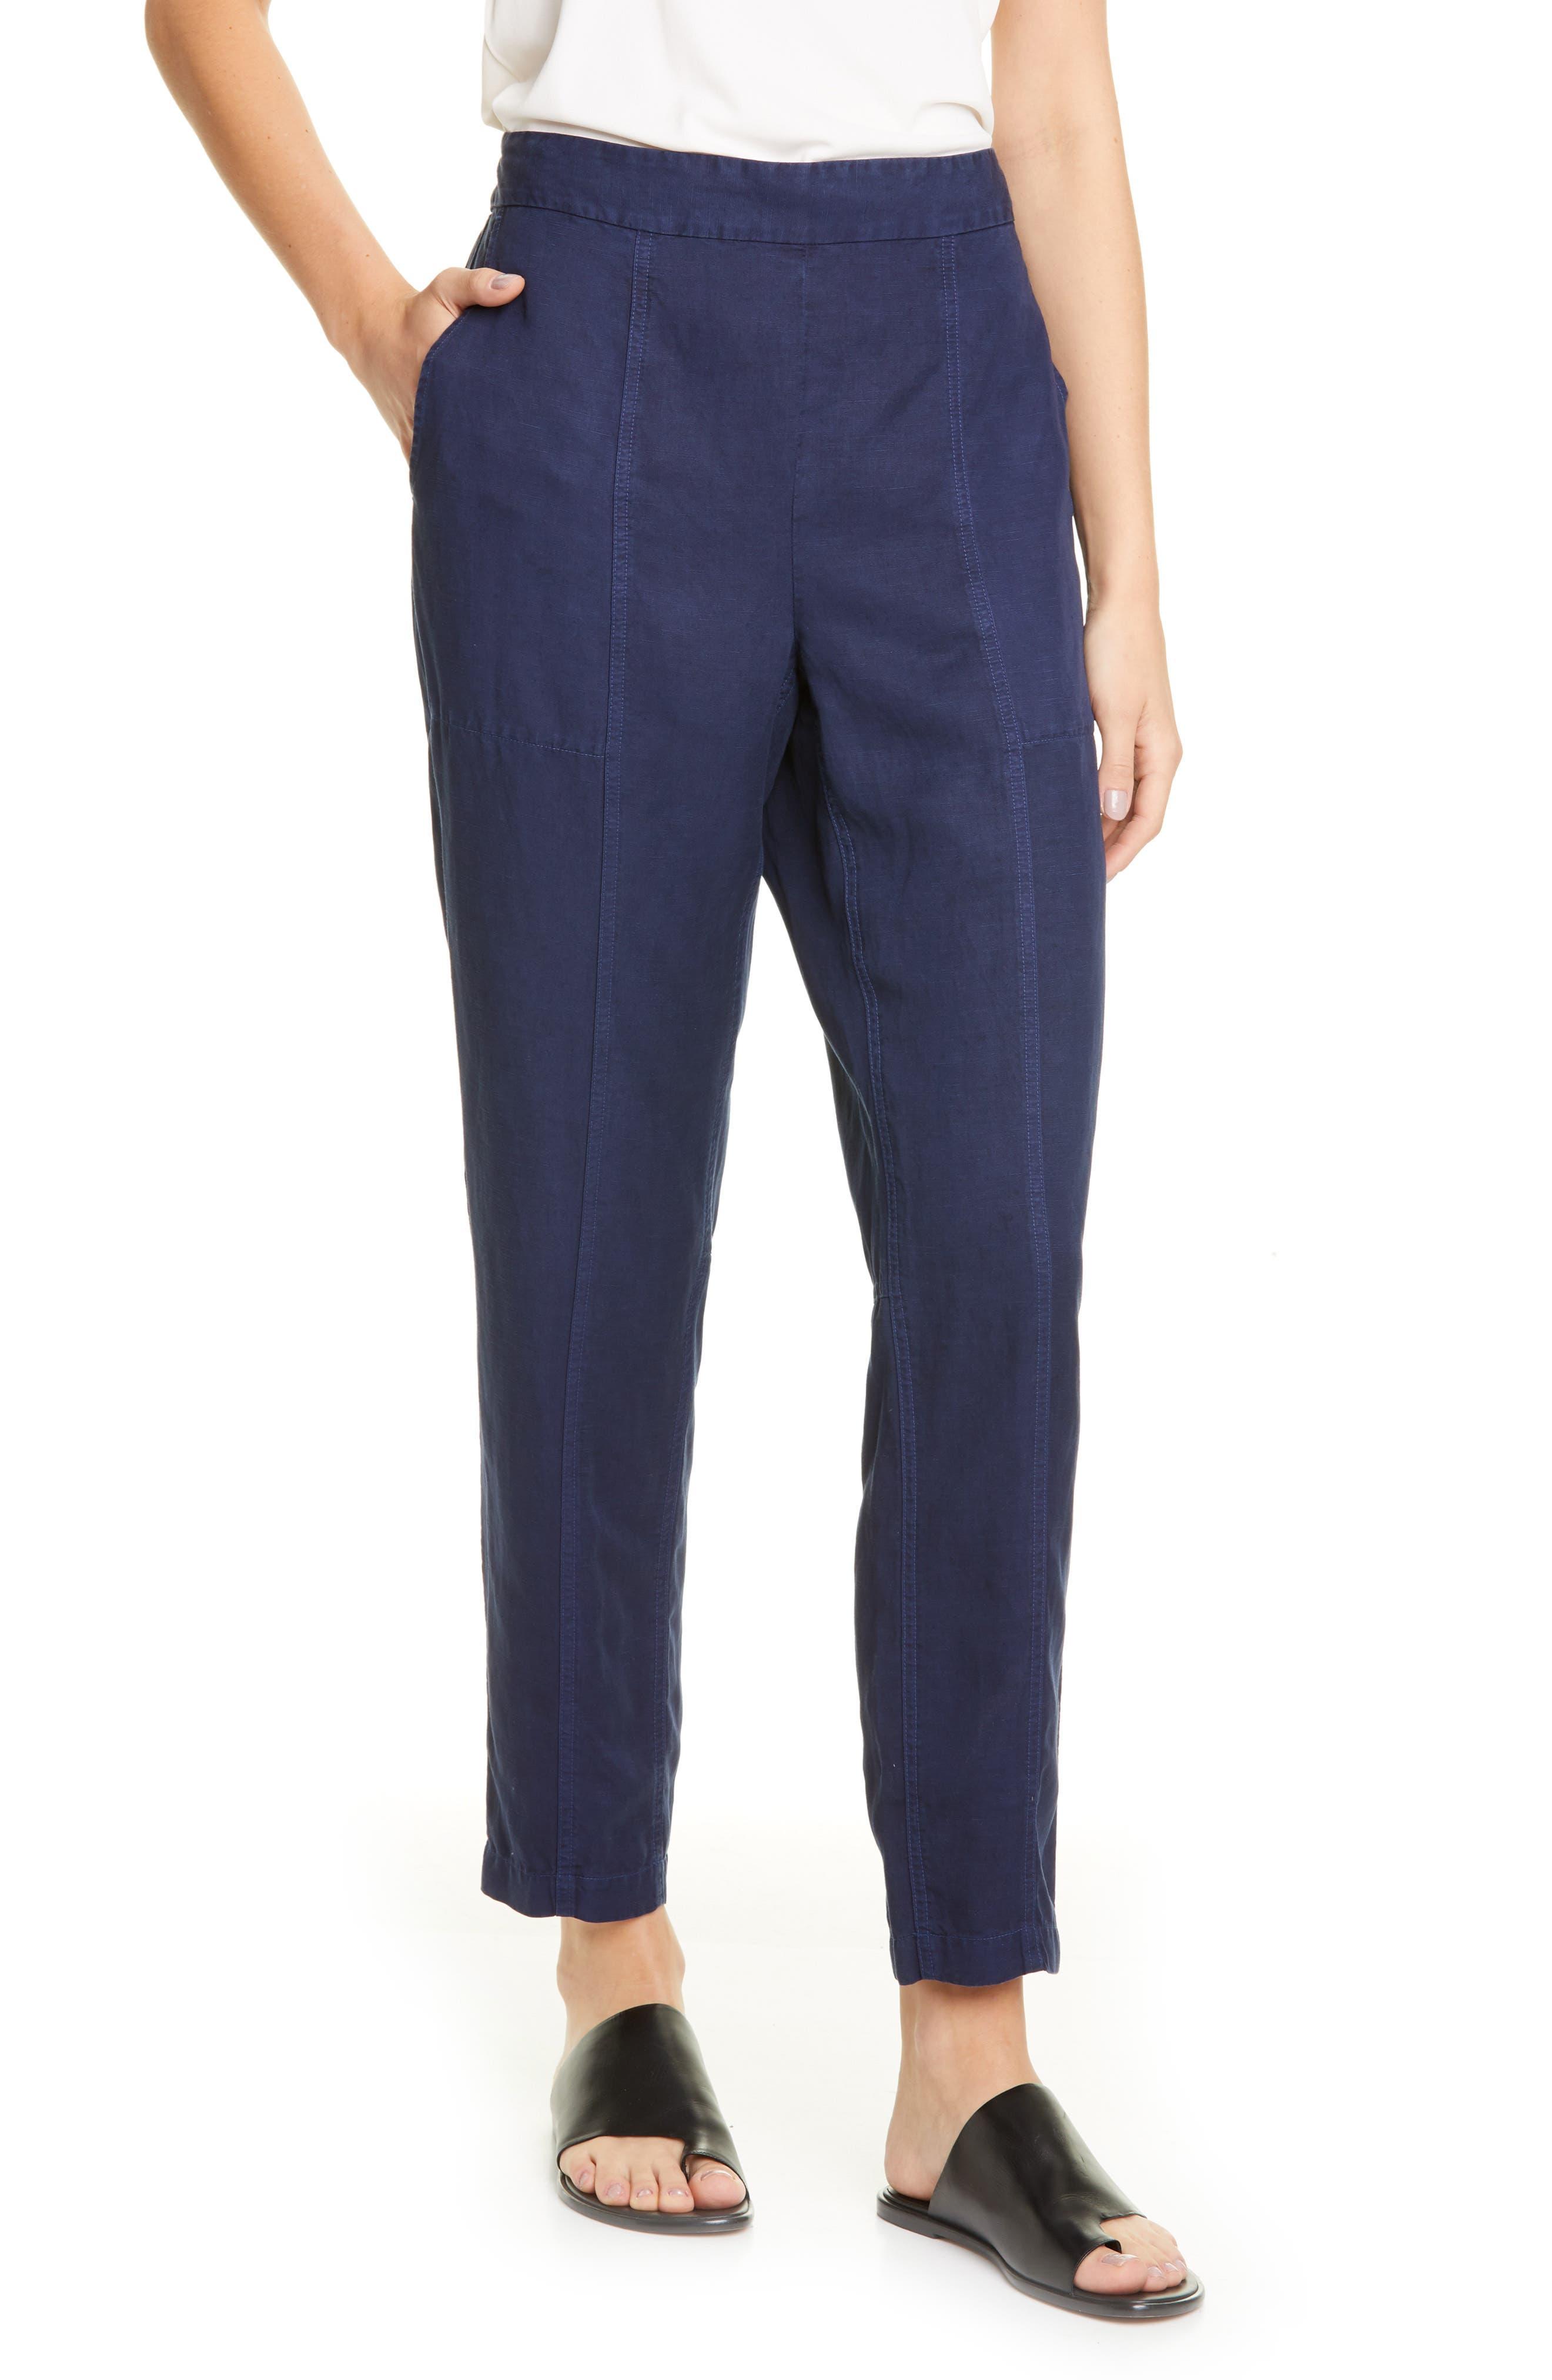 Eileen Fisher Ankle Pants (Regular & Petite)